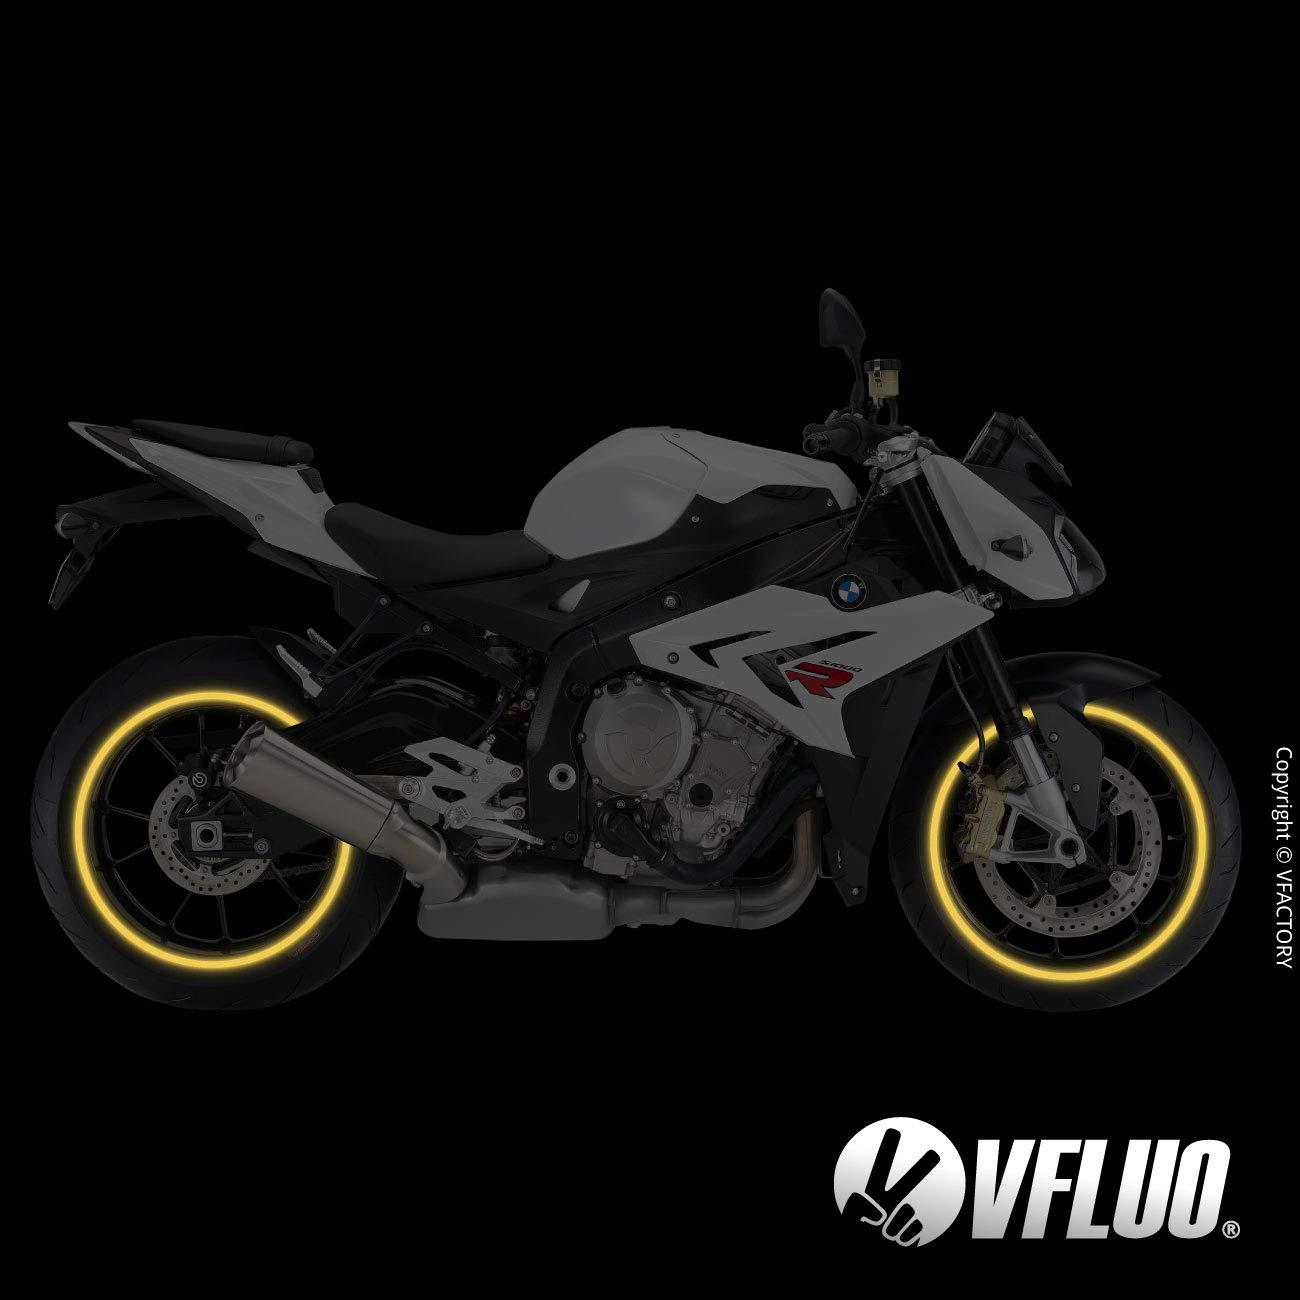 motorcycle retro reflective wheel stripes kit Dark blue 7 mm width 3M Technology/™ VFLUO CIRCULAR/™ 1 wheel